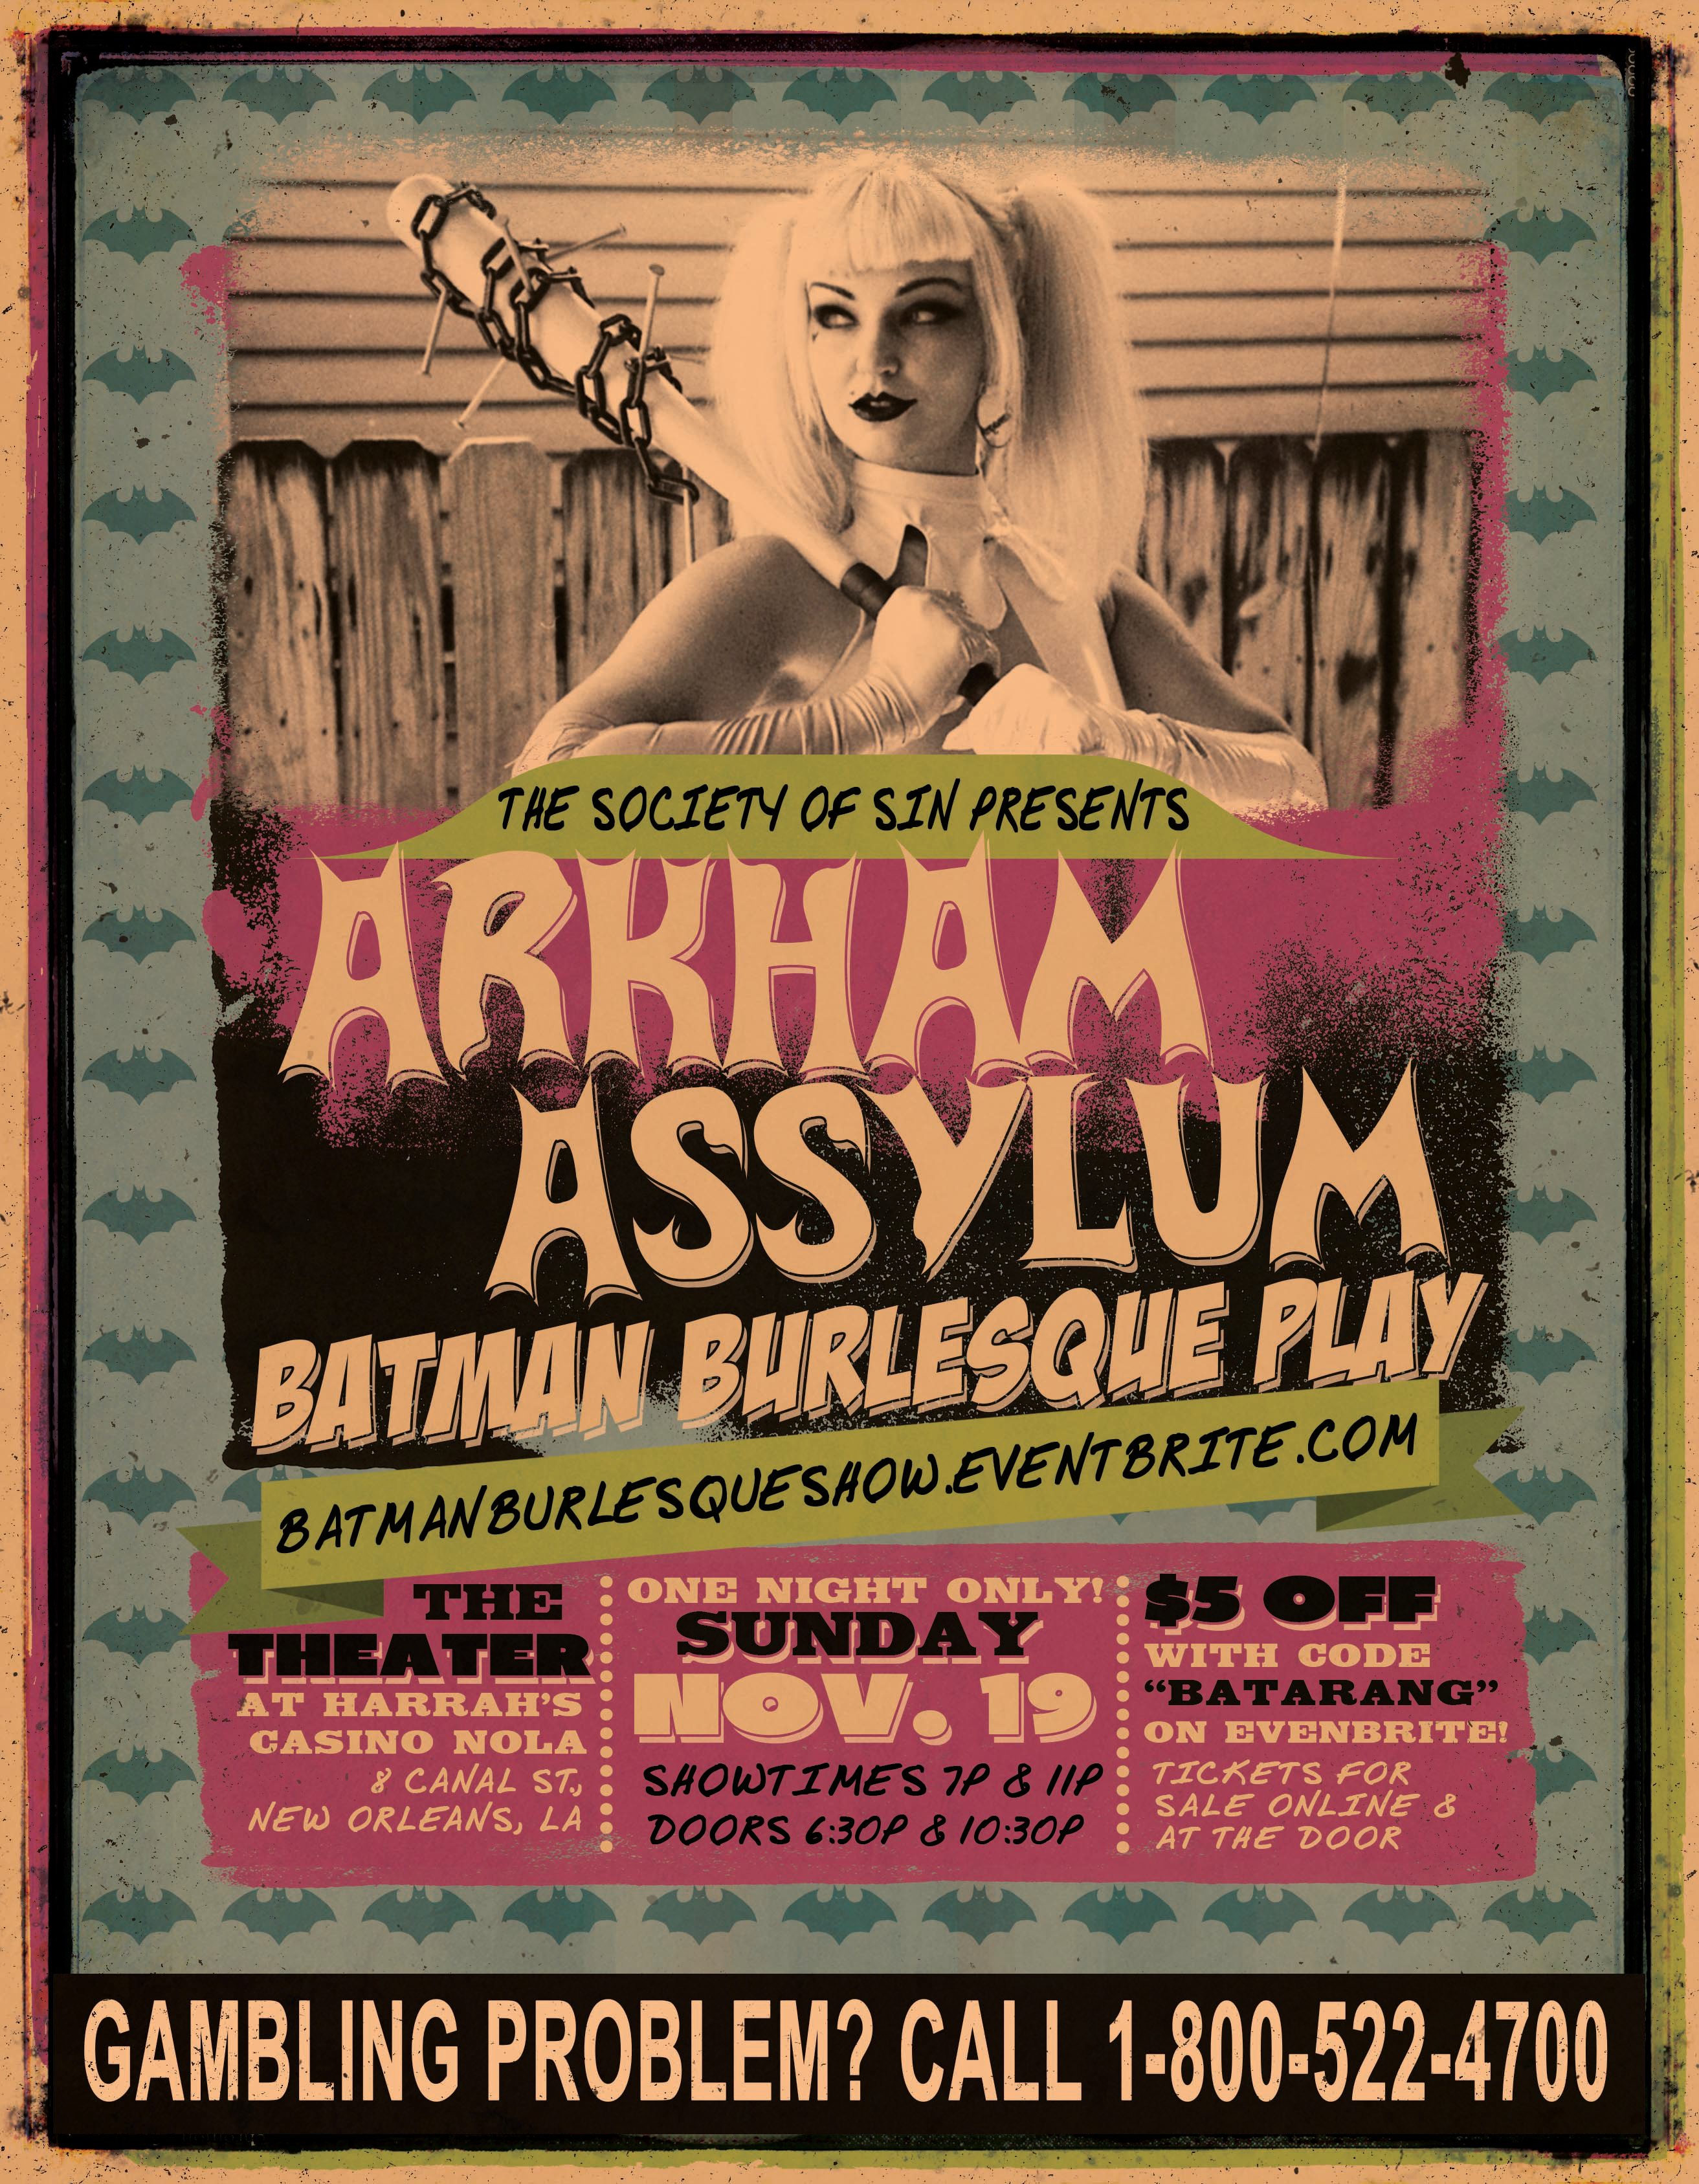 Arkham ASSylum Batman Burlesque